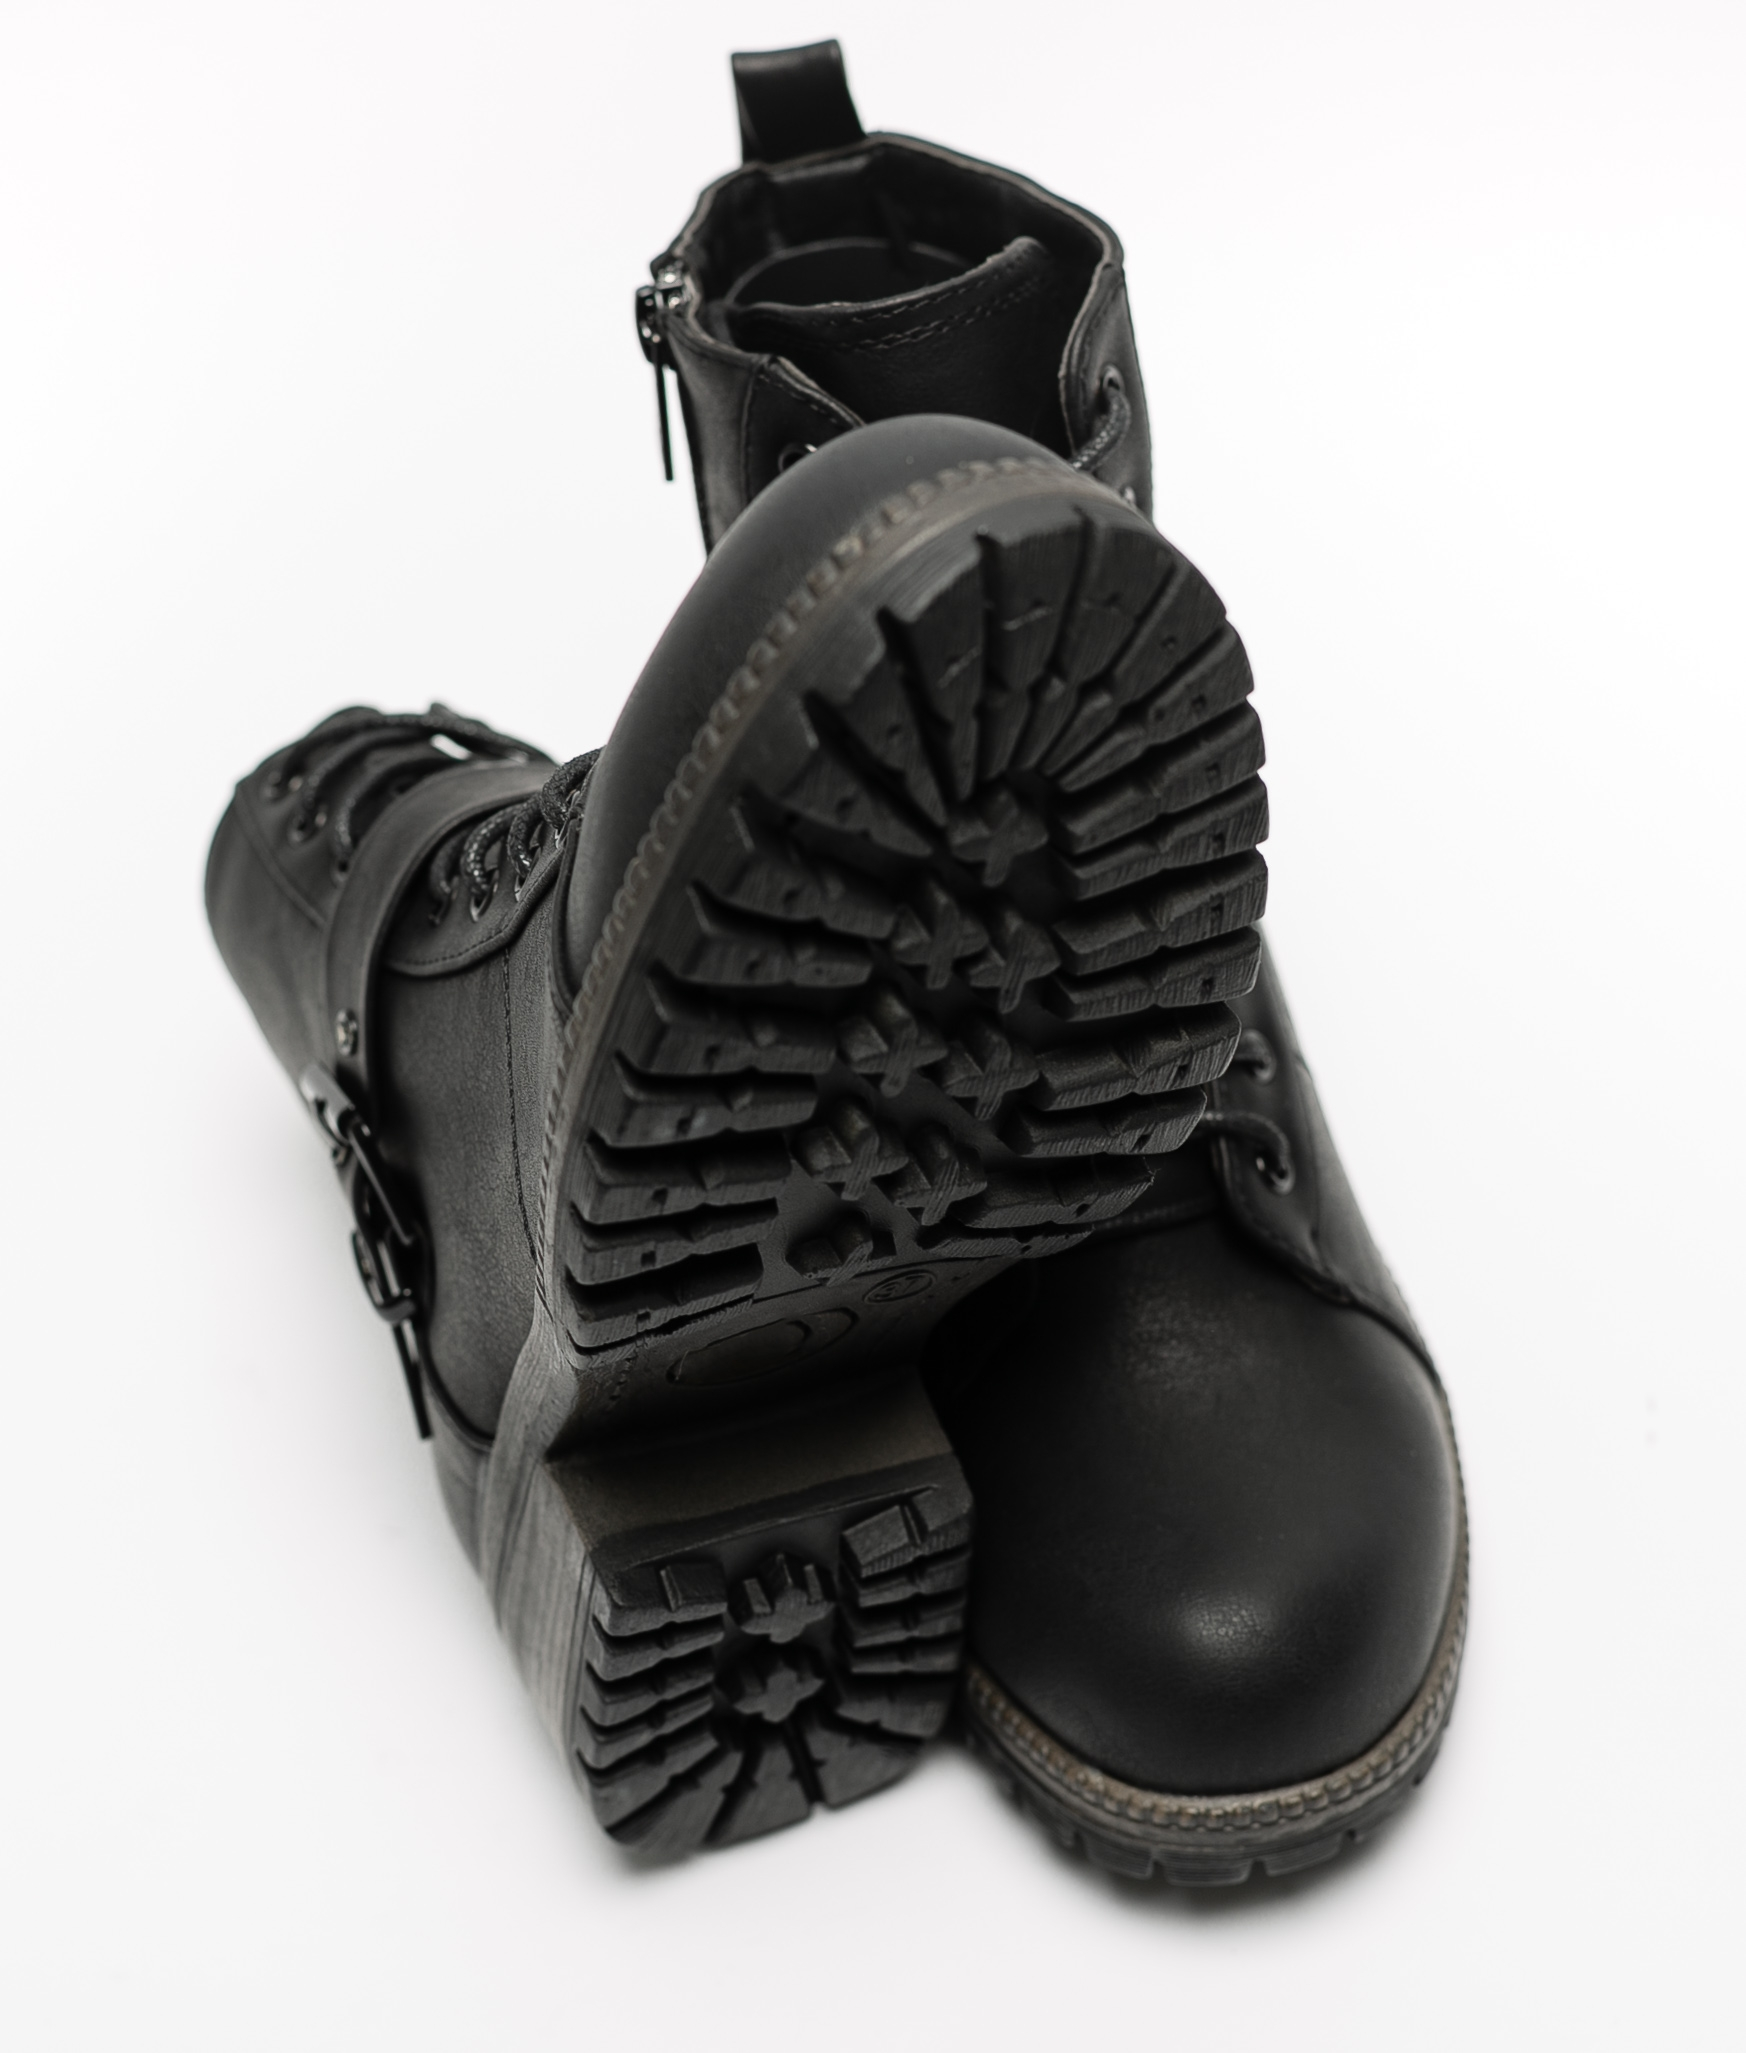 Bota Baja Zendi - Negro